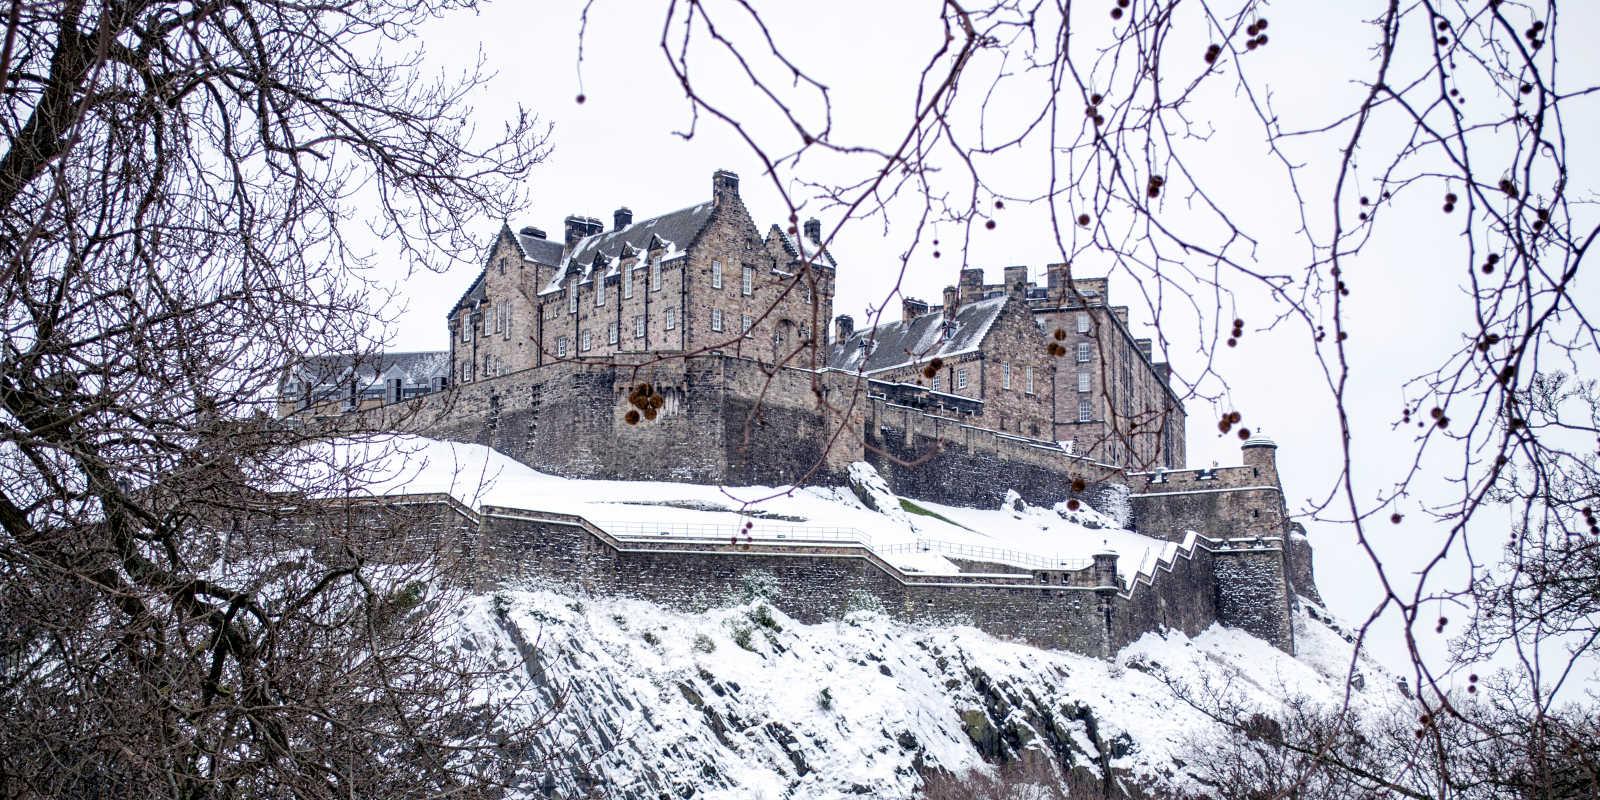 Edinburgh Castle on a snowy day